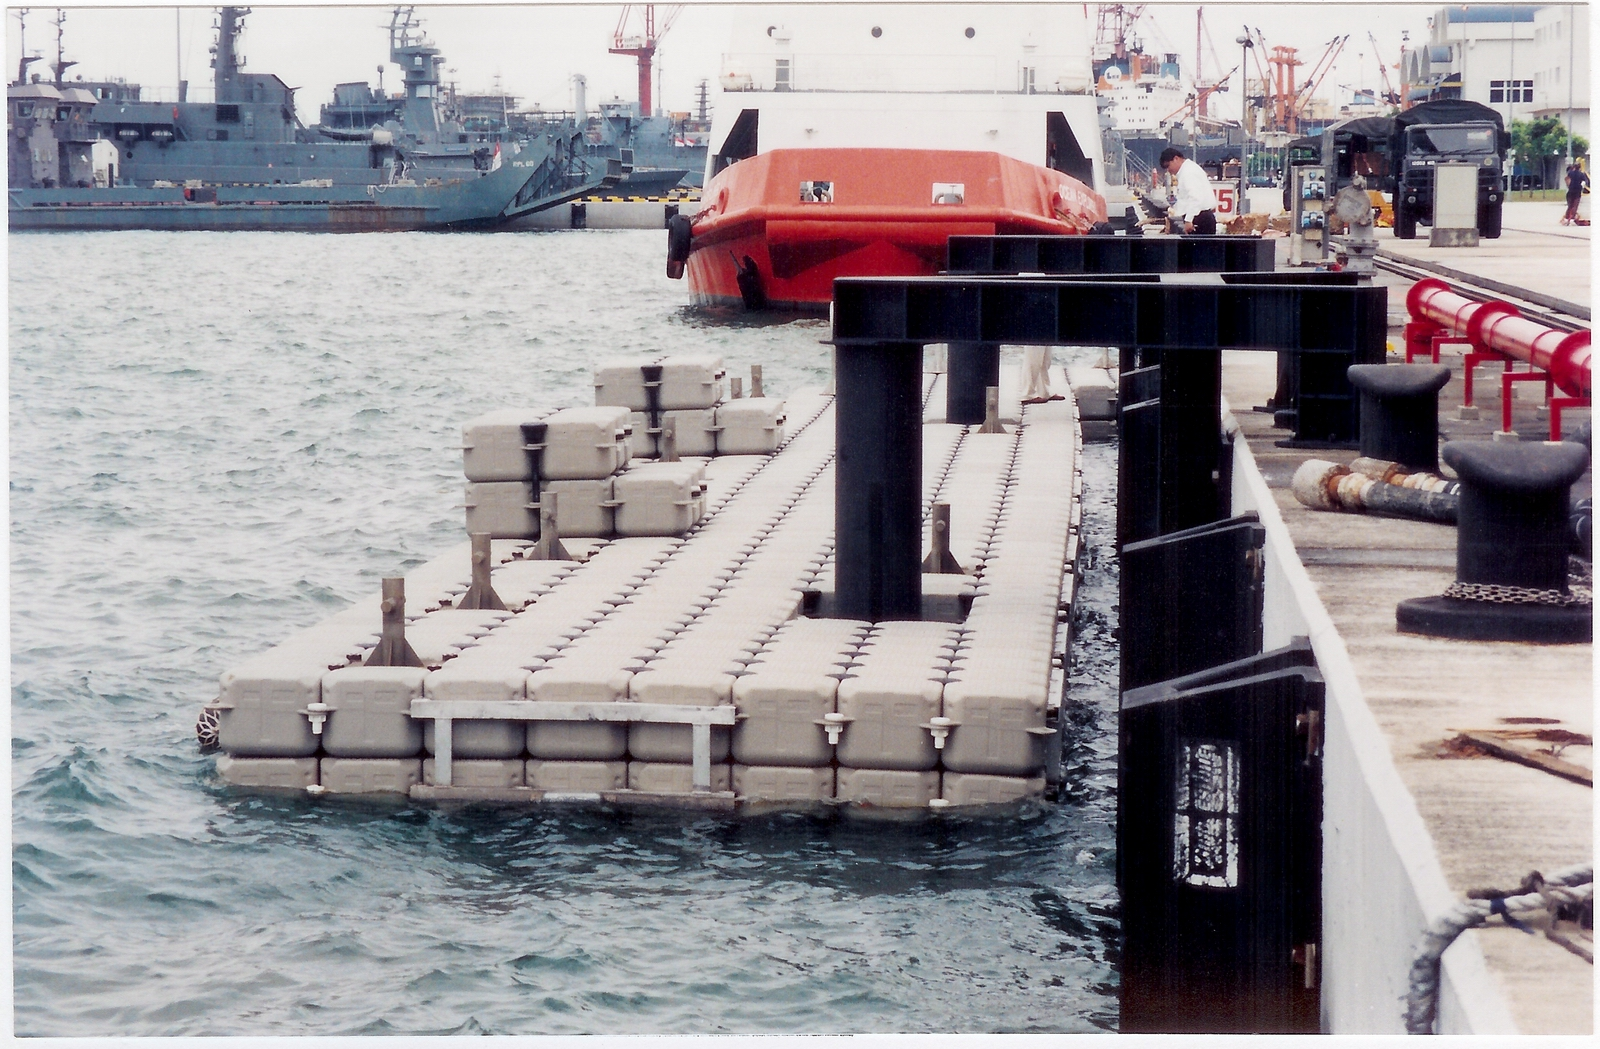 Muelles flotantes modulares puerto singapur